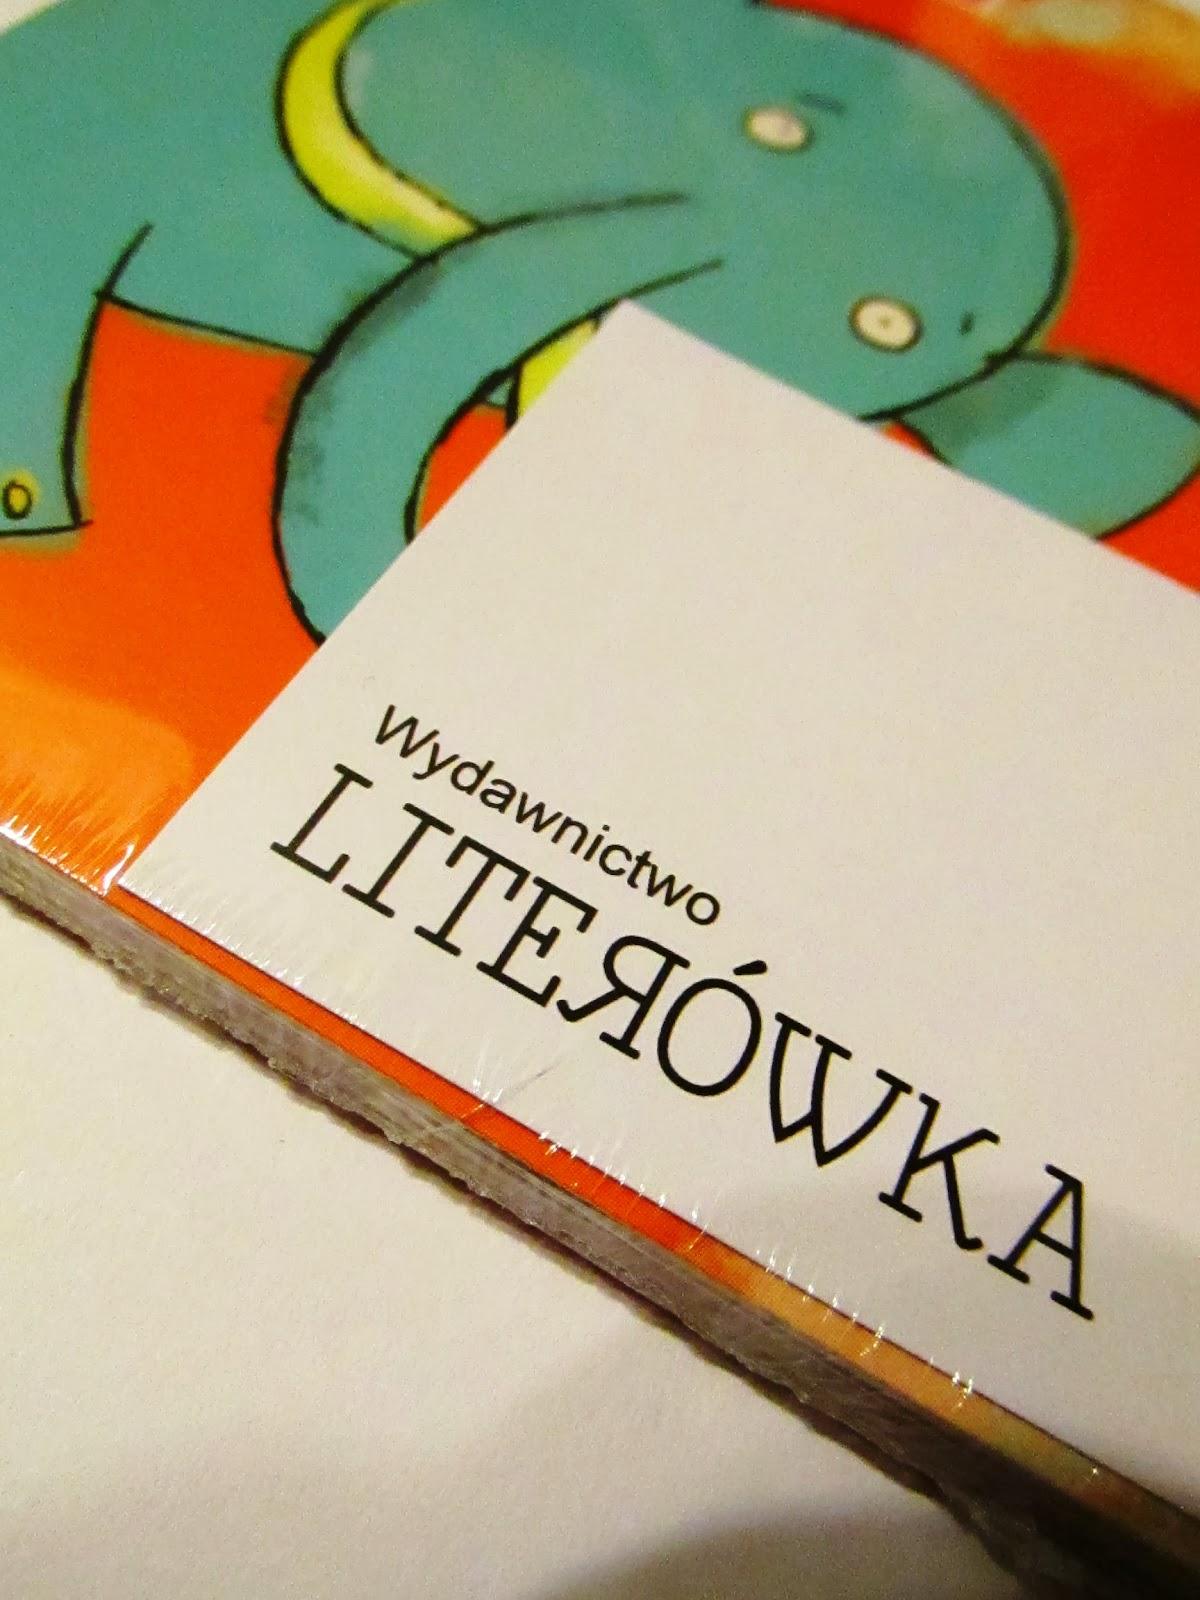 http://www.literowka.com/